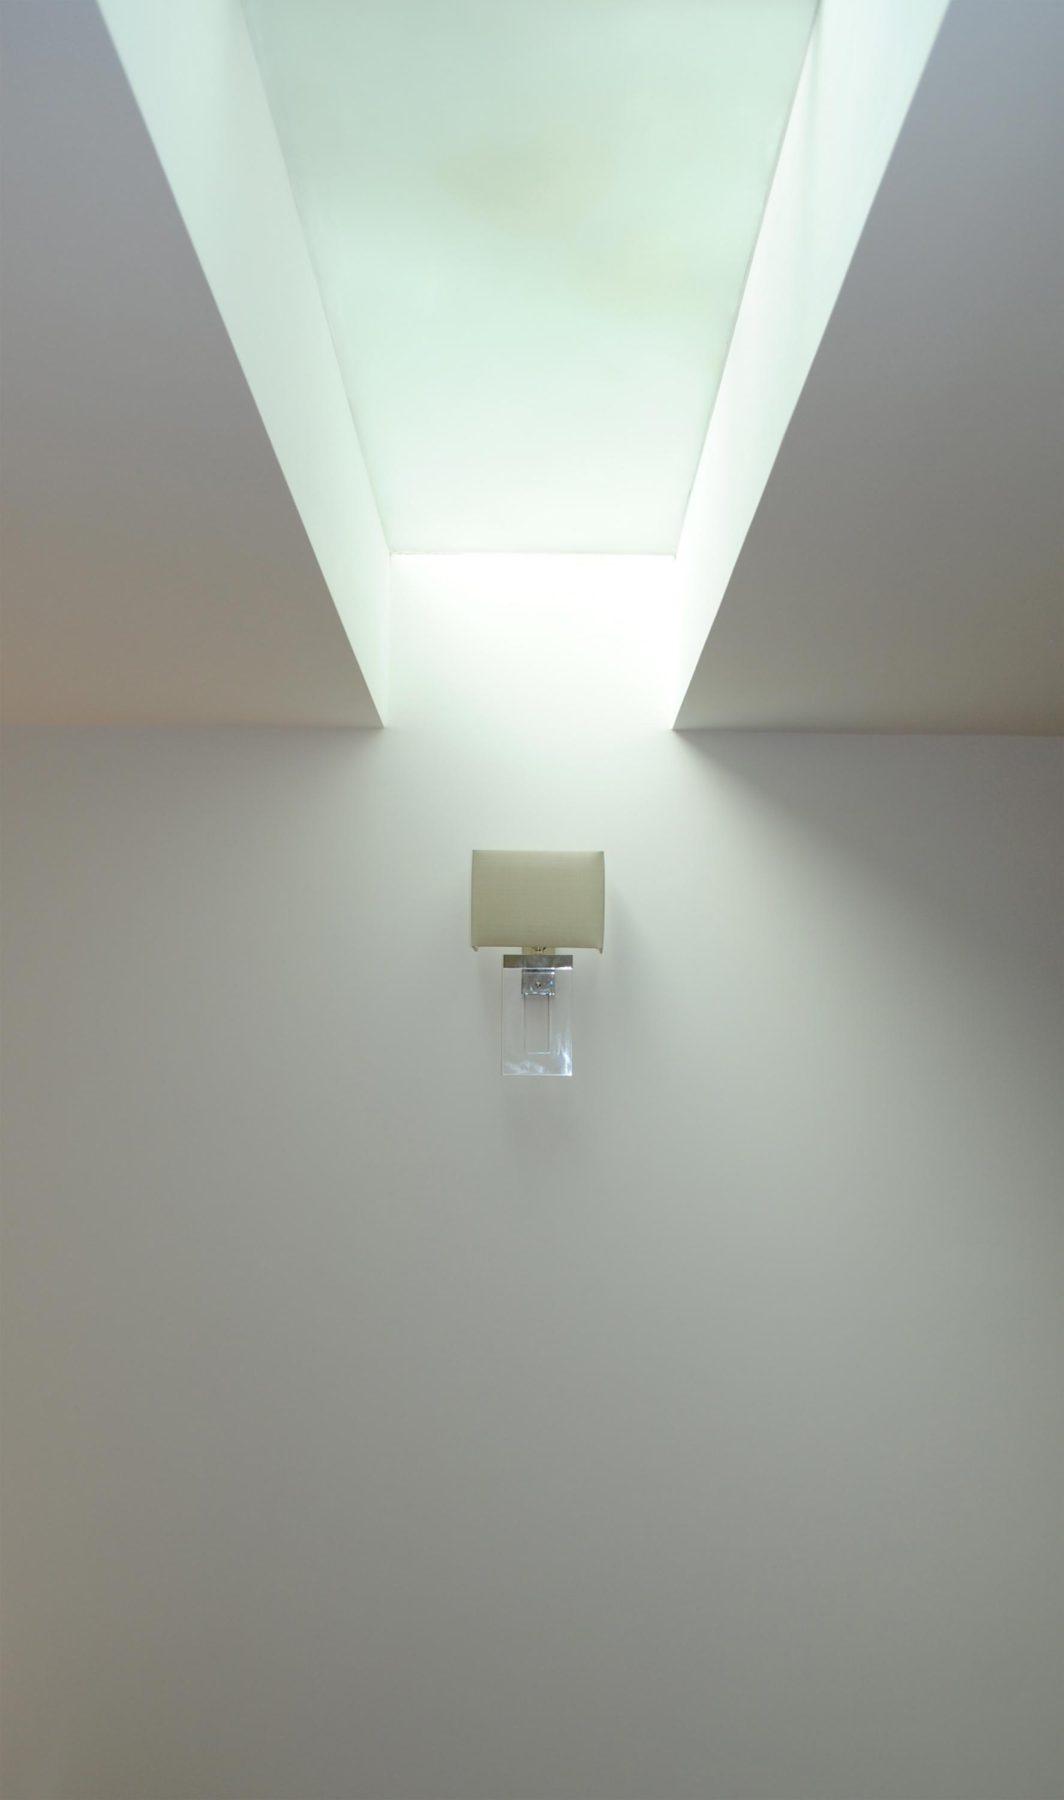 Walpole St 04 Basement Extension Rooflight